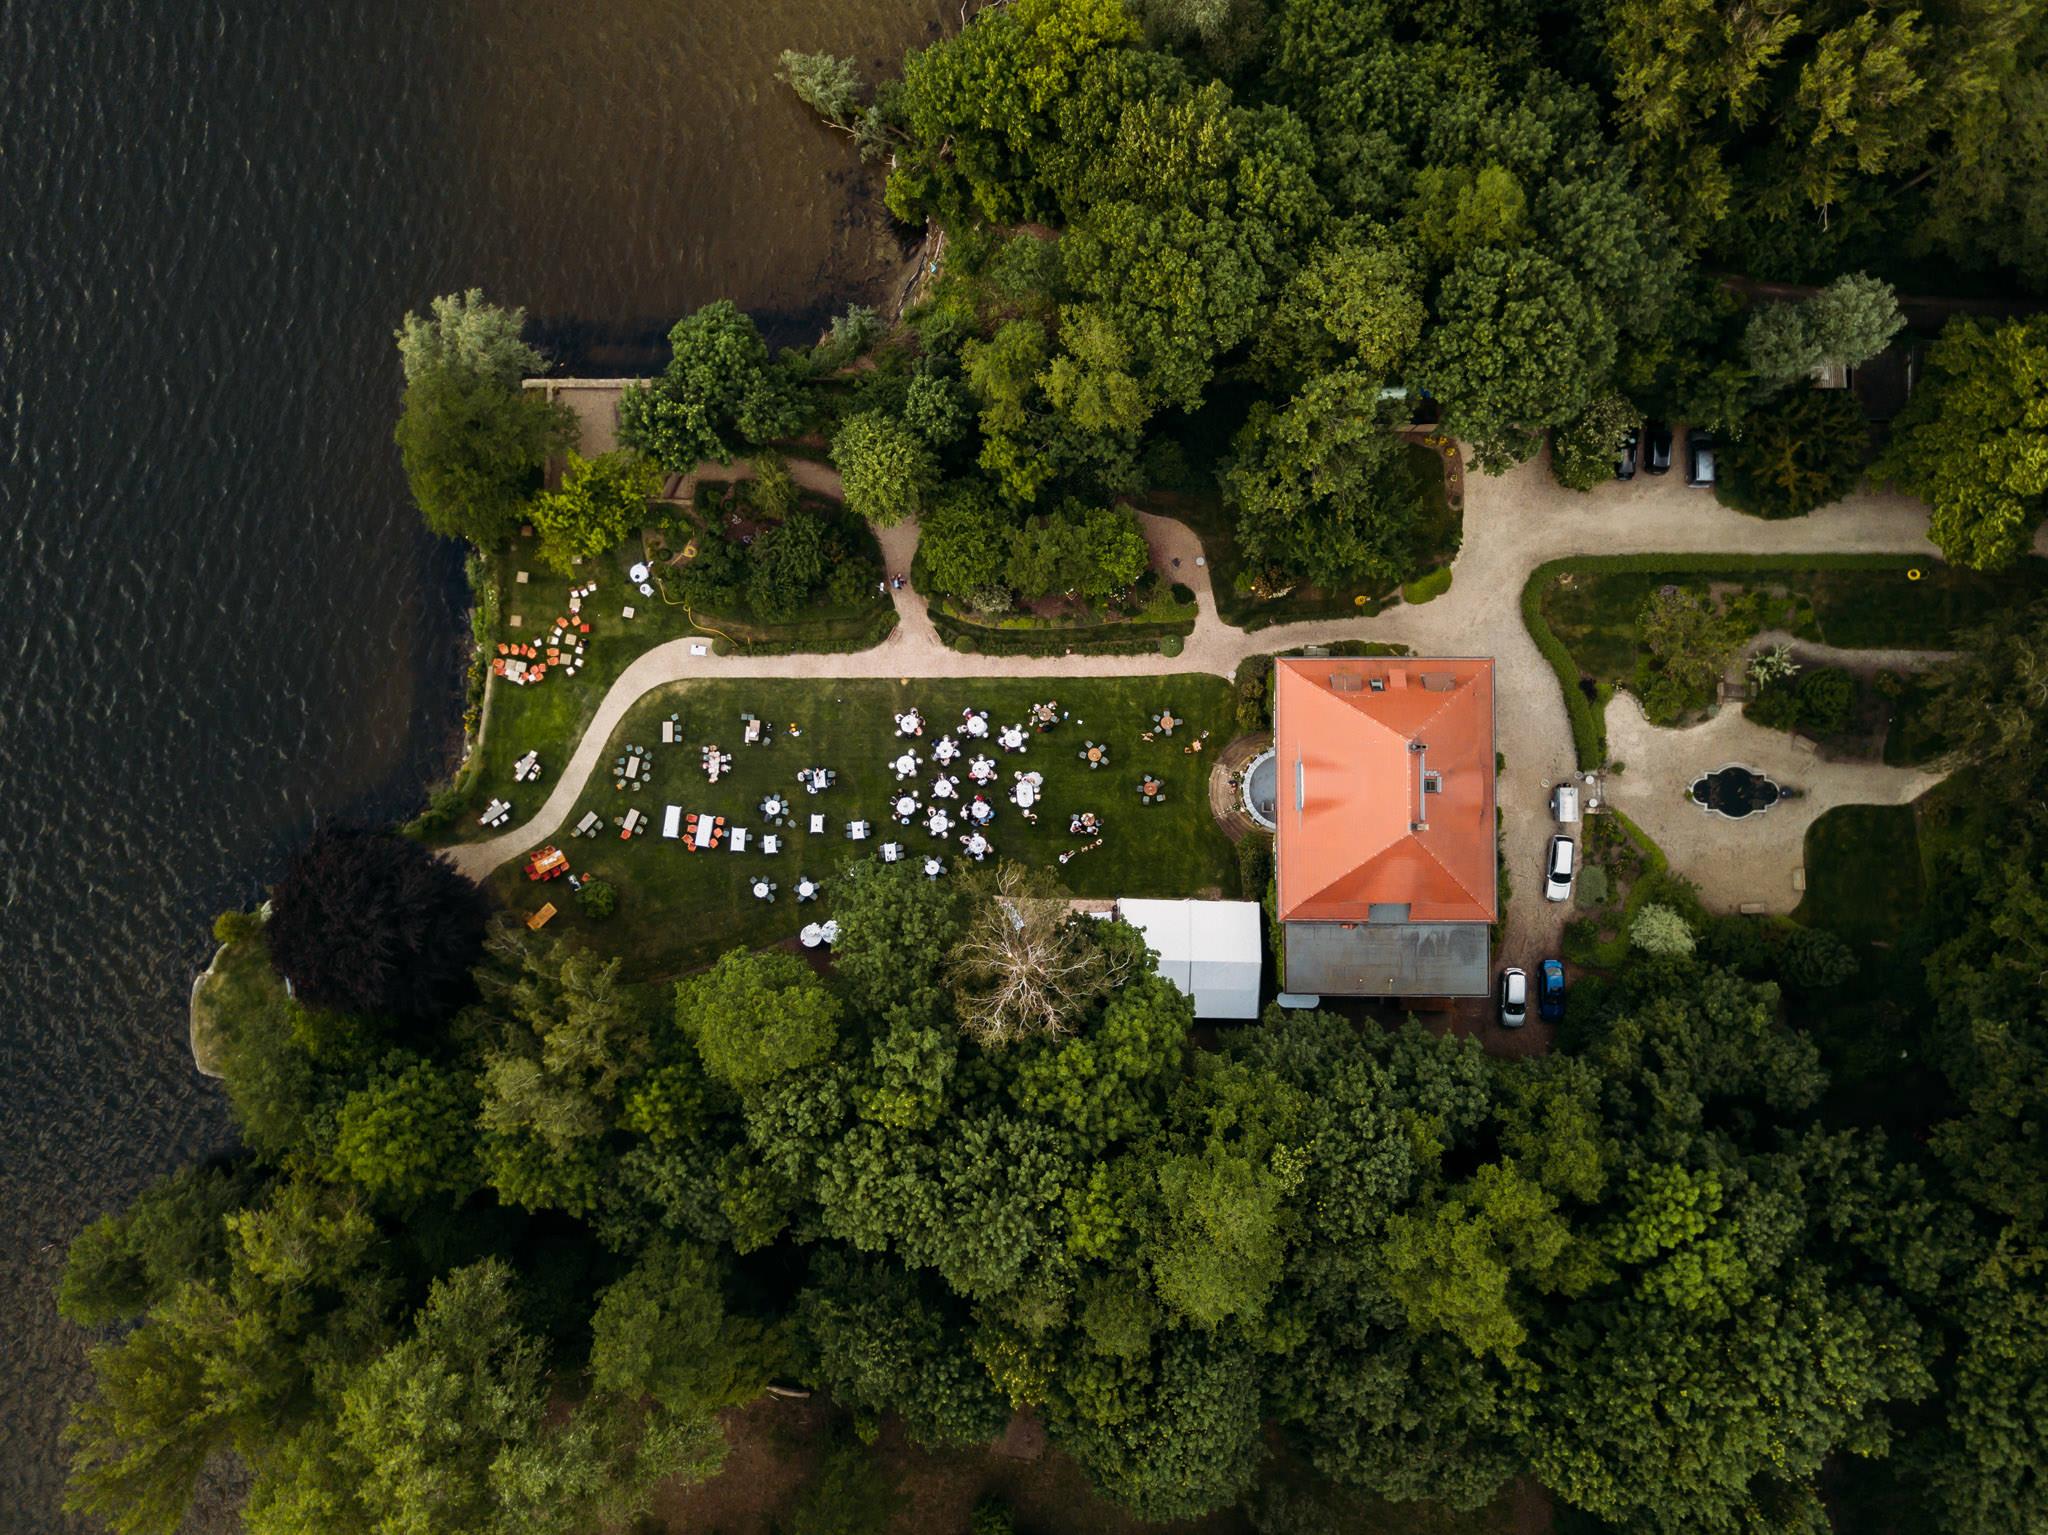 190531_Hochzeit_Potsdam_Schloss_Gut_Golm_Vorschau_web_0023.jpg